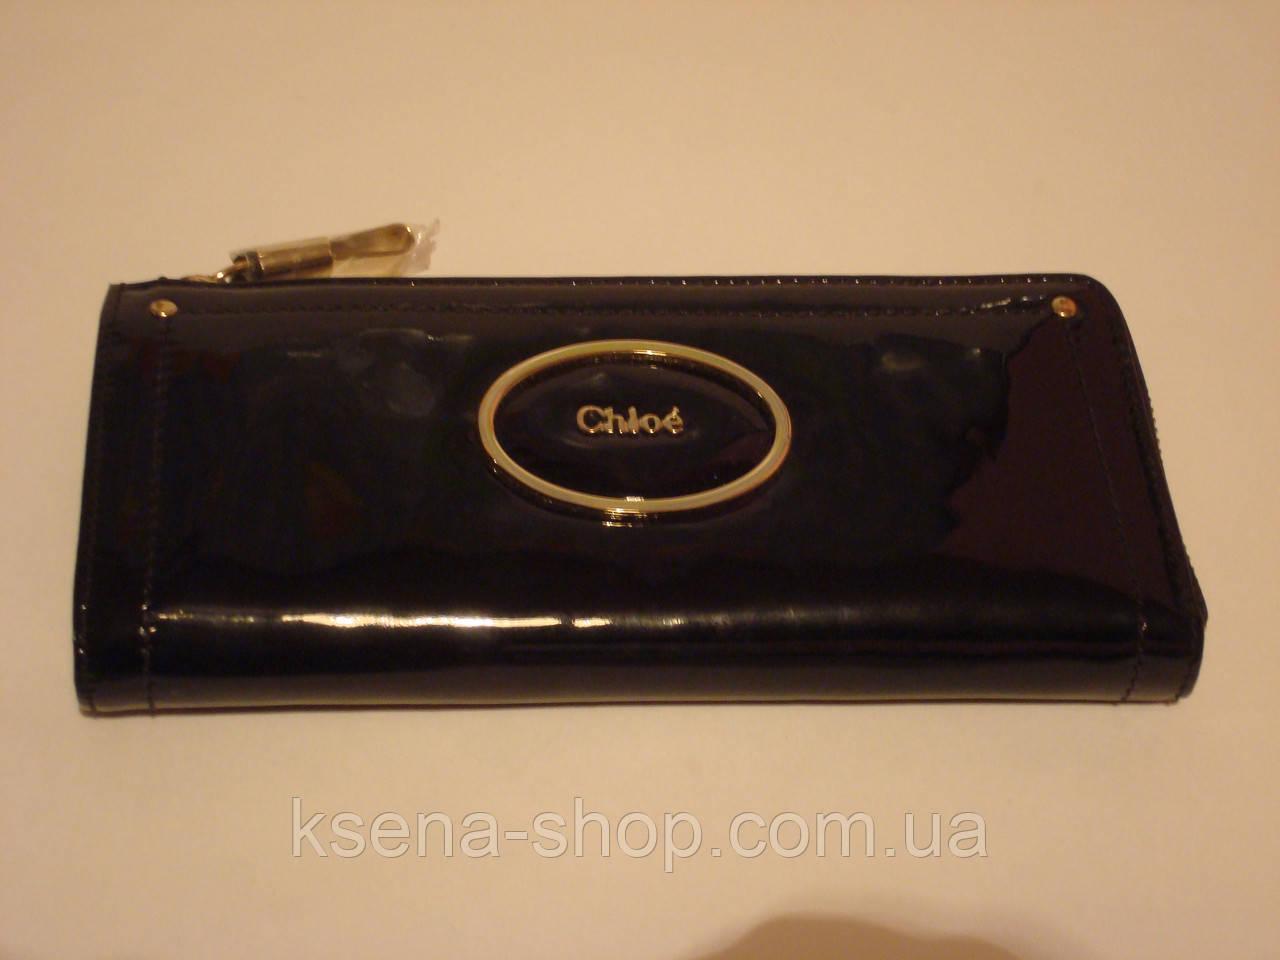 912a2925eb55 Женский кошелек Chloe-2, цена 420 грн., купить в Одессе — Prom.ua ...